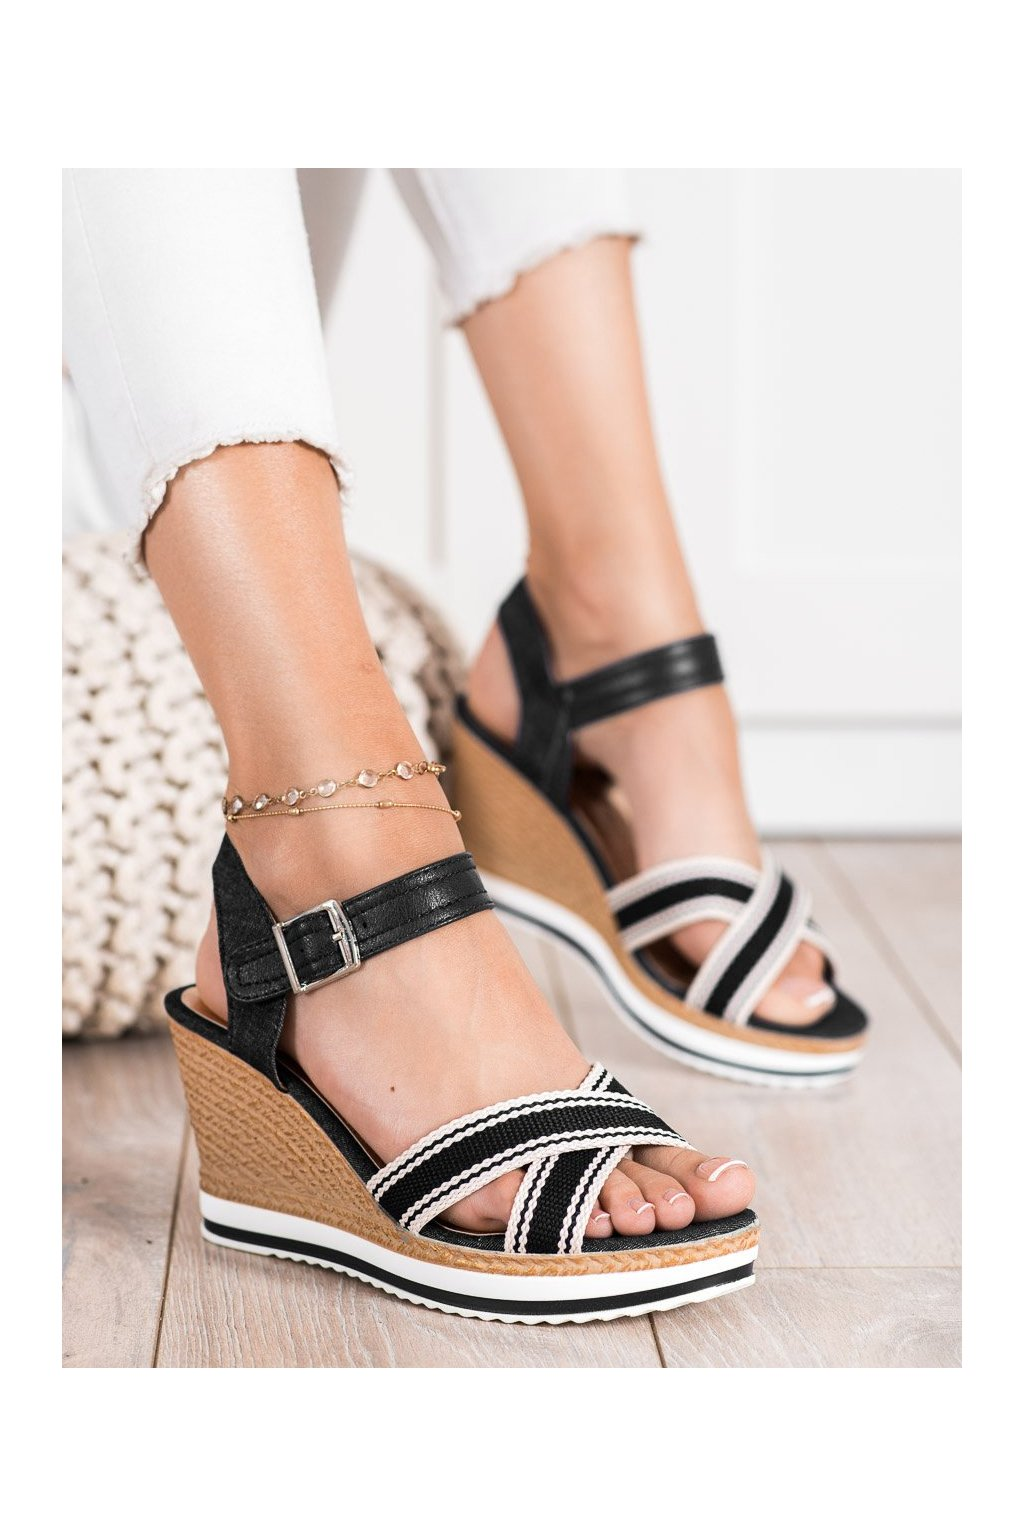 Čierne dámske sandále Shelovet kod A89930B